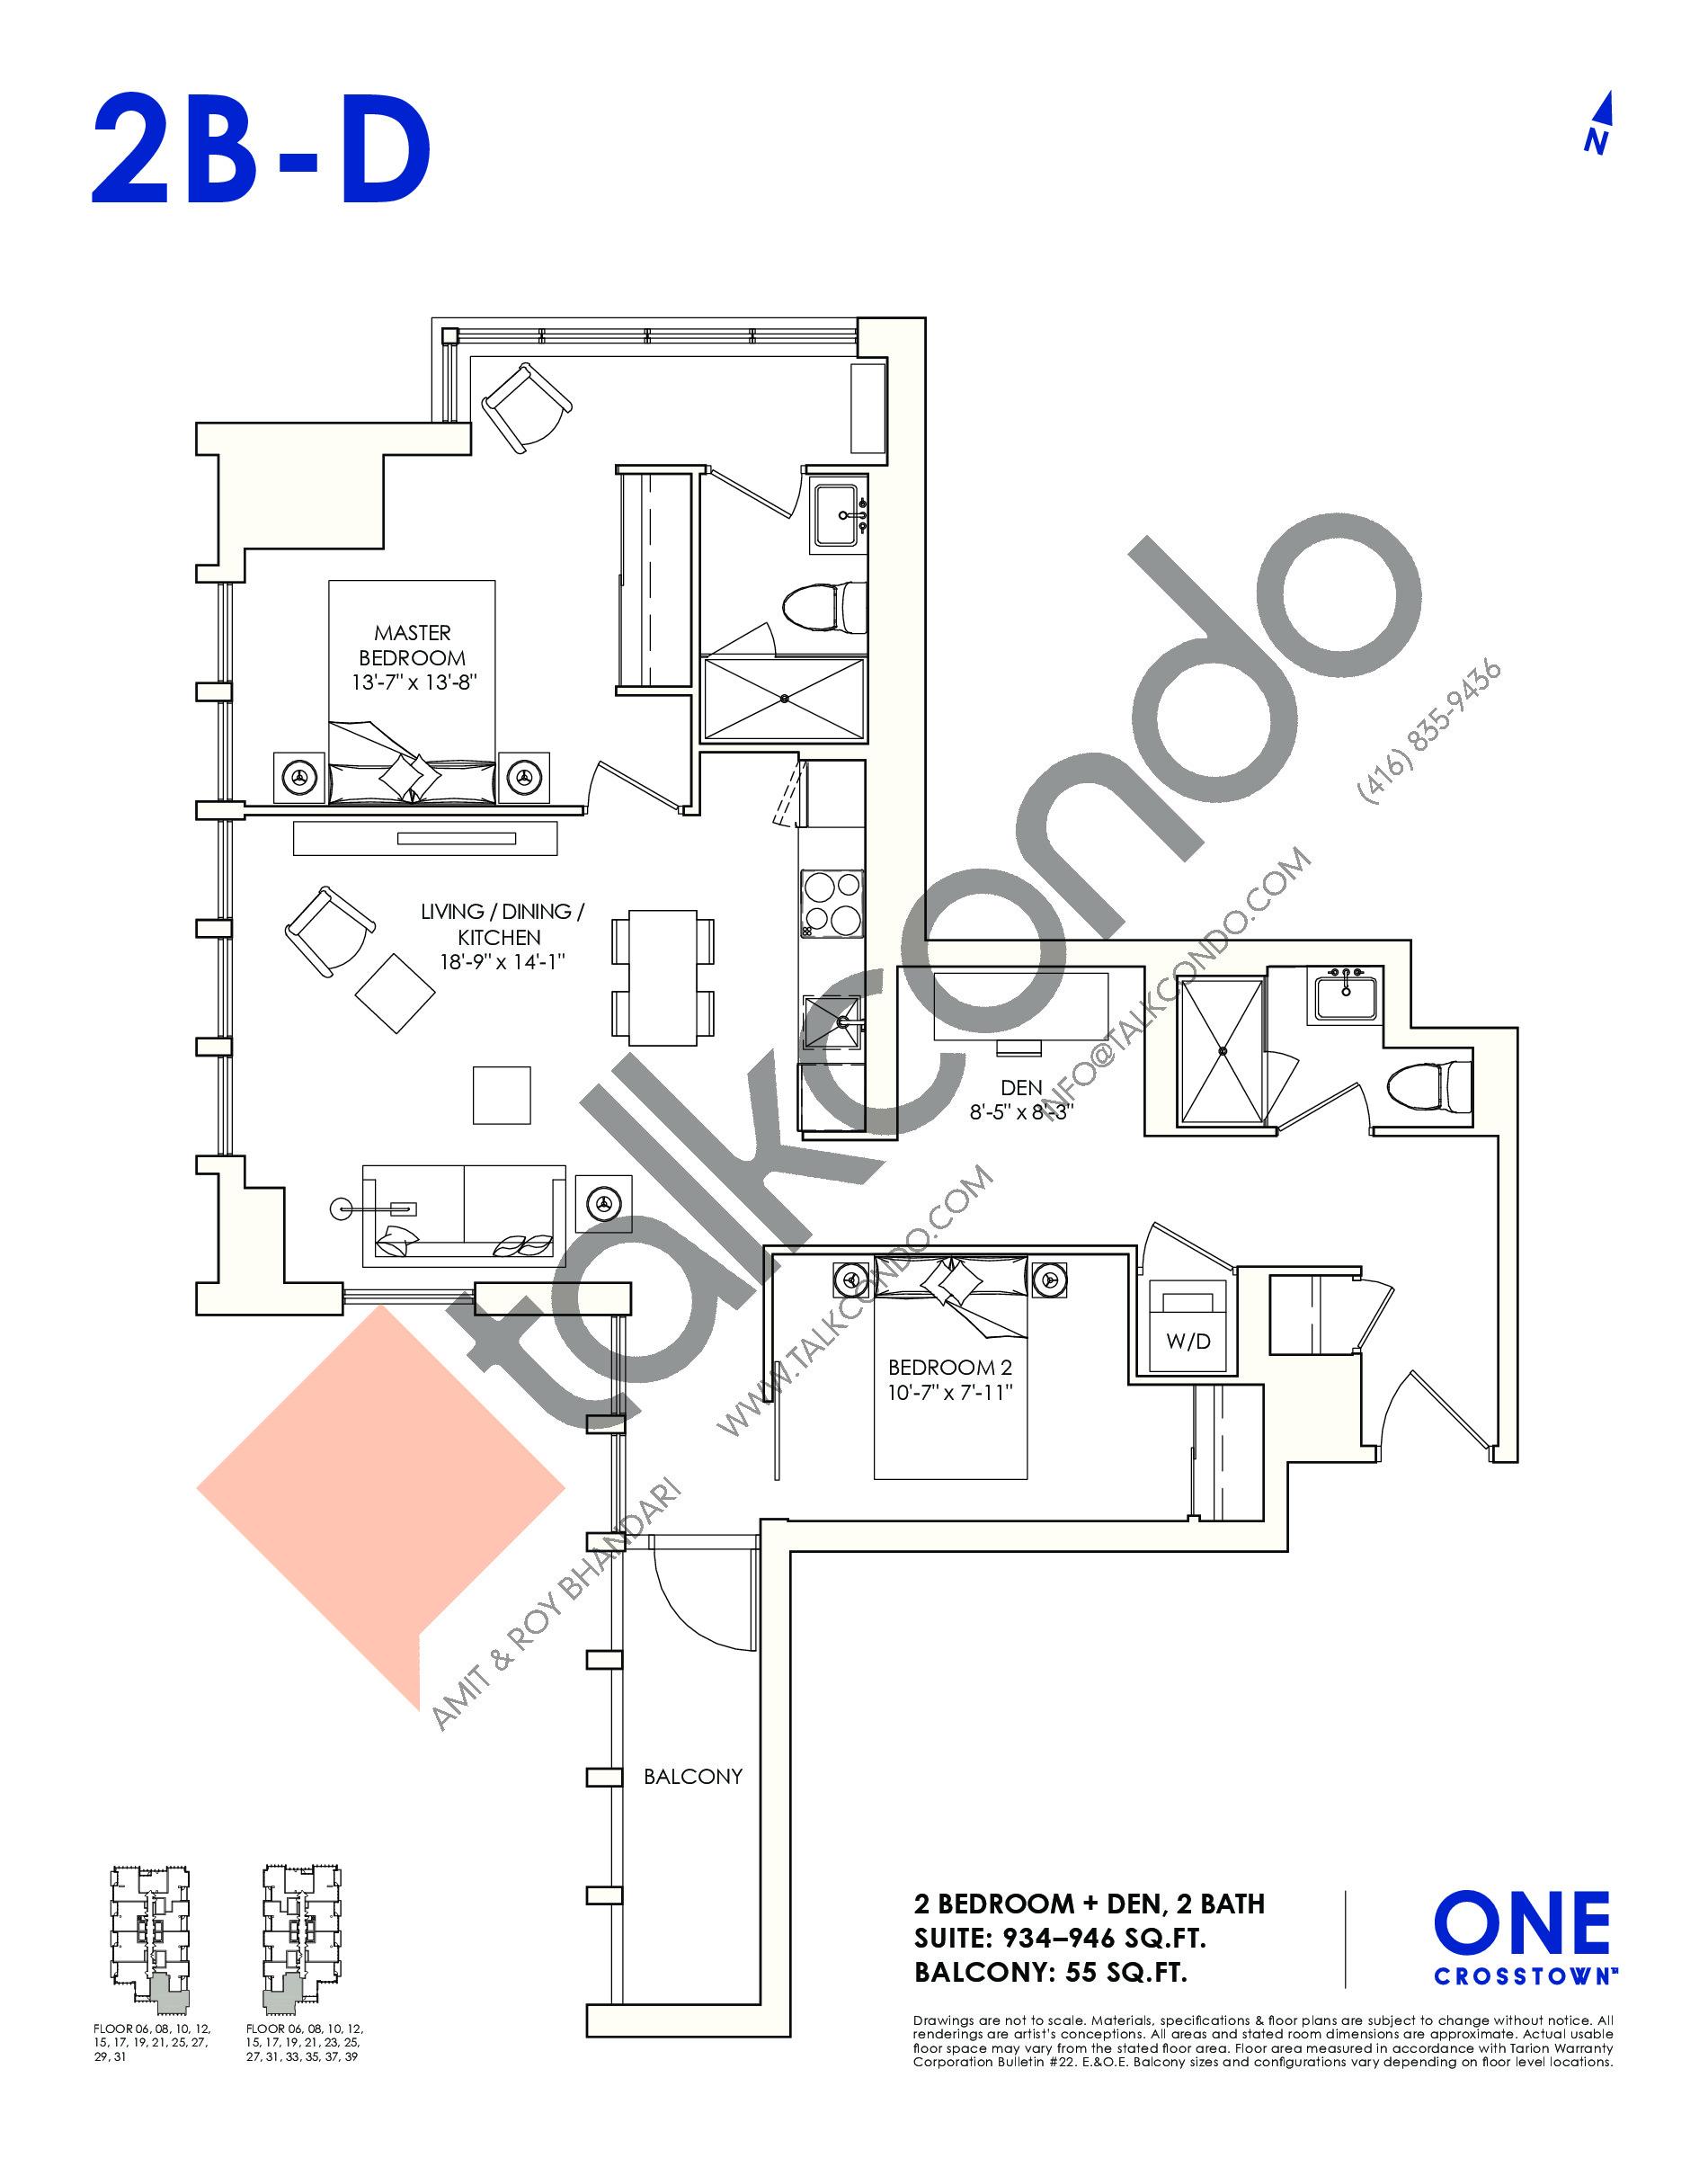 2B-D Floor Plan at One Crosstown Condos - 946 sq.ft